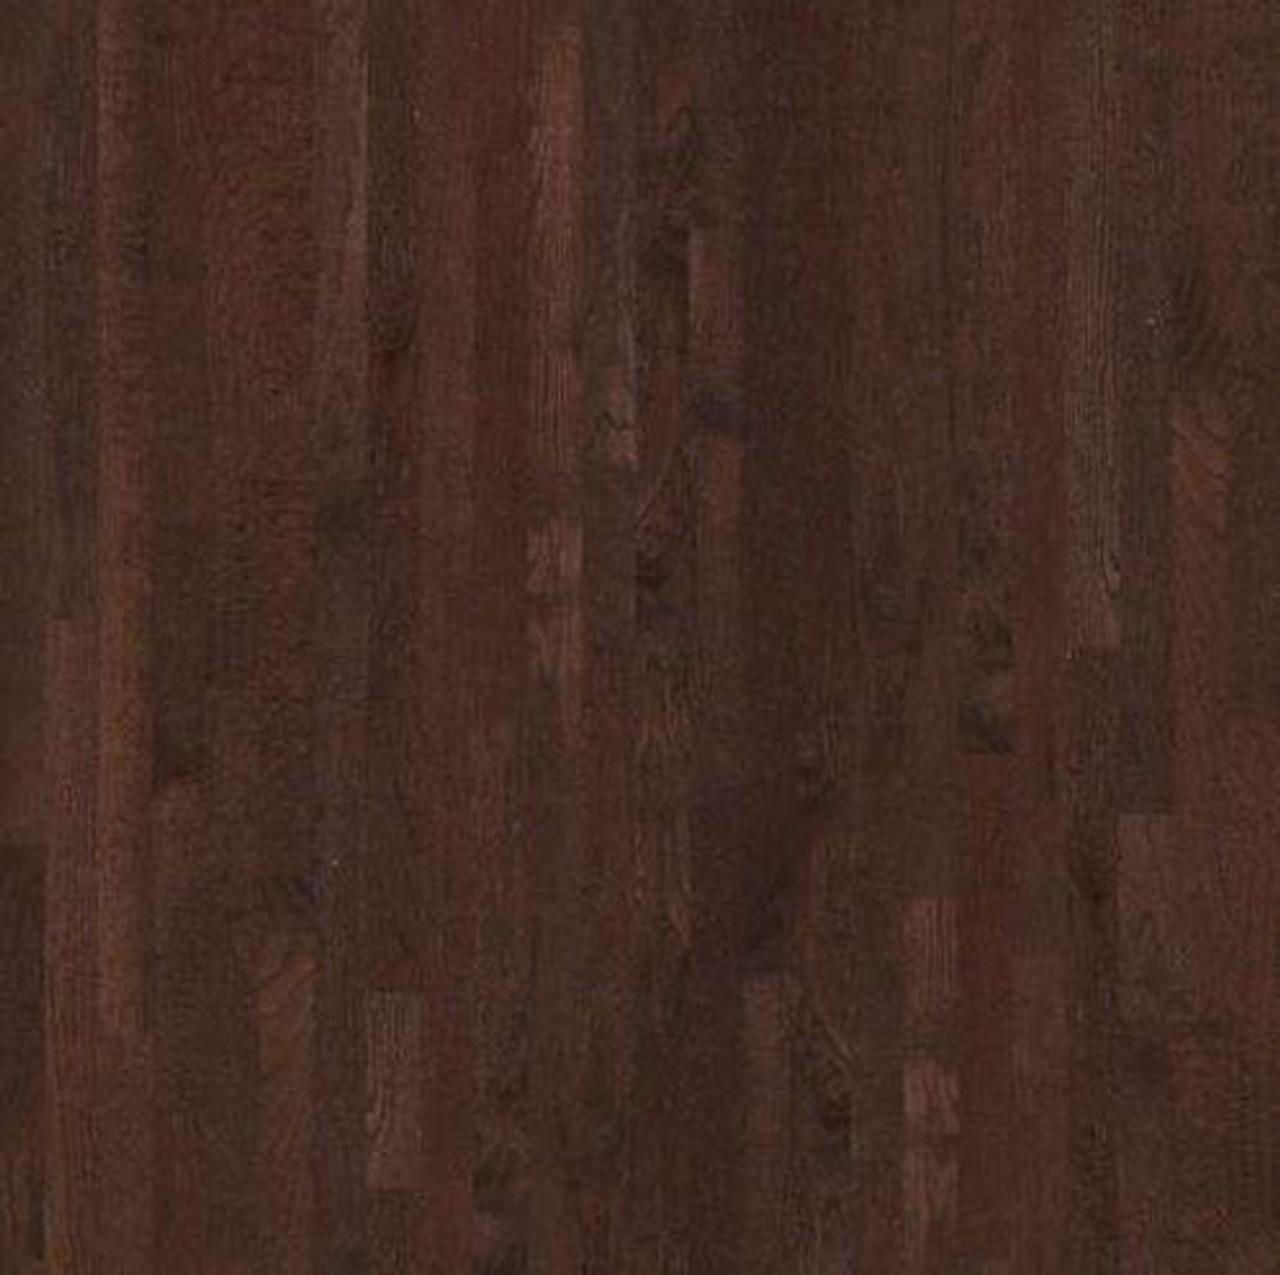 "Shaw Coffee Bean | 2-1/4"" x 3/4"" | Solid Hardwood | 1st Quality [25 SF / Box]"